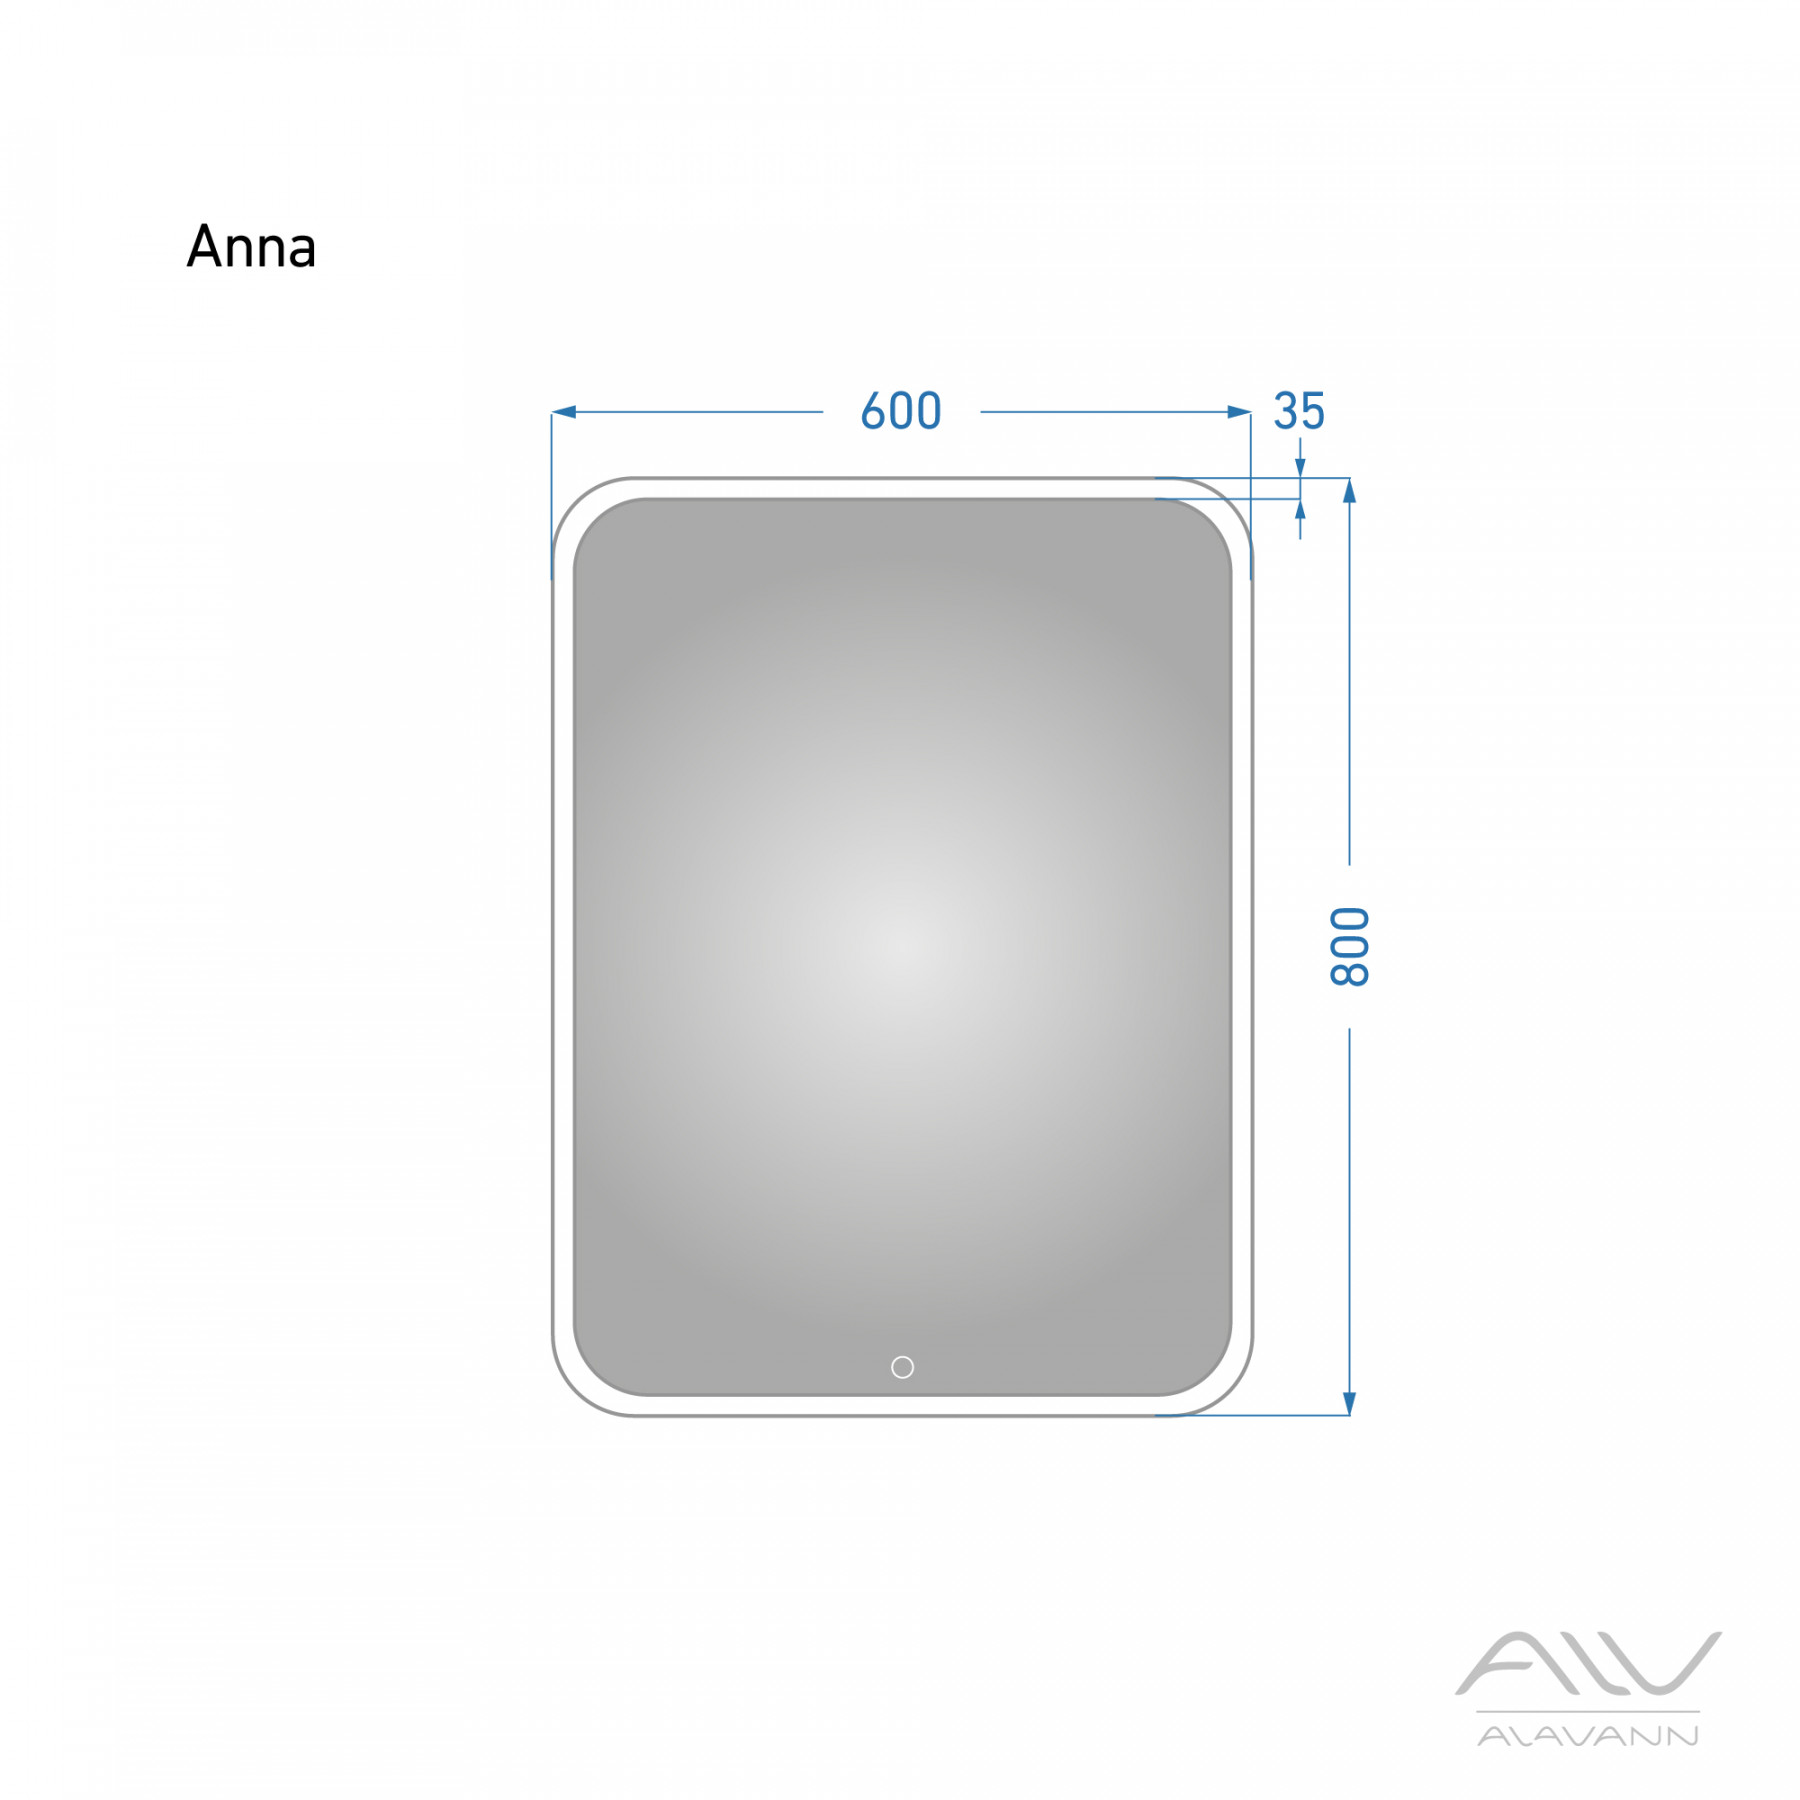 Зеркало с подсветкой Alavann Anna 60X80